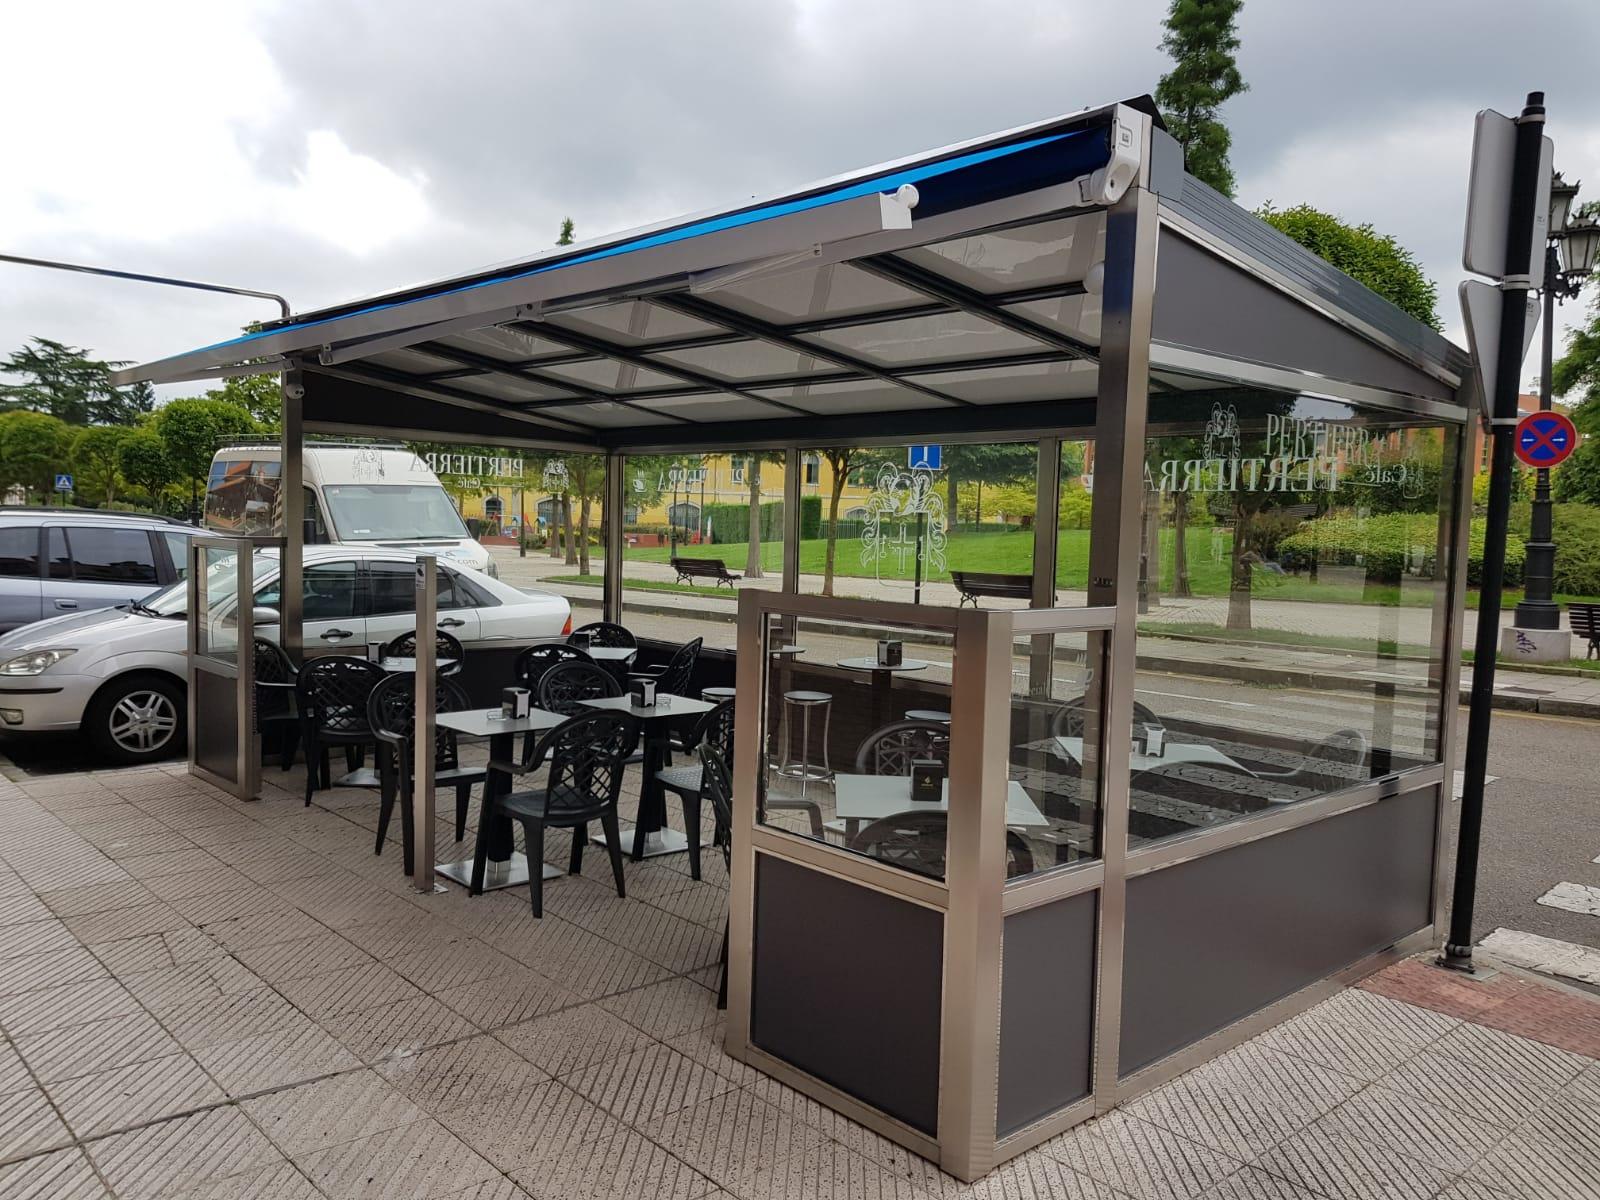 Café Pertierra Oviedo